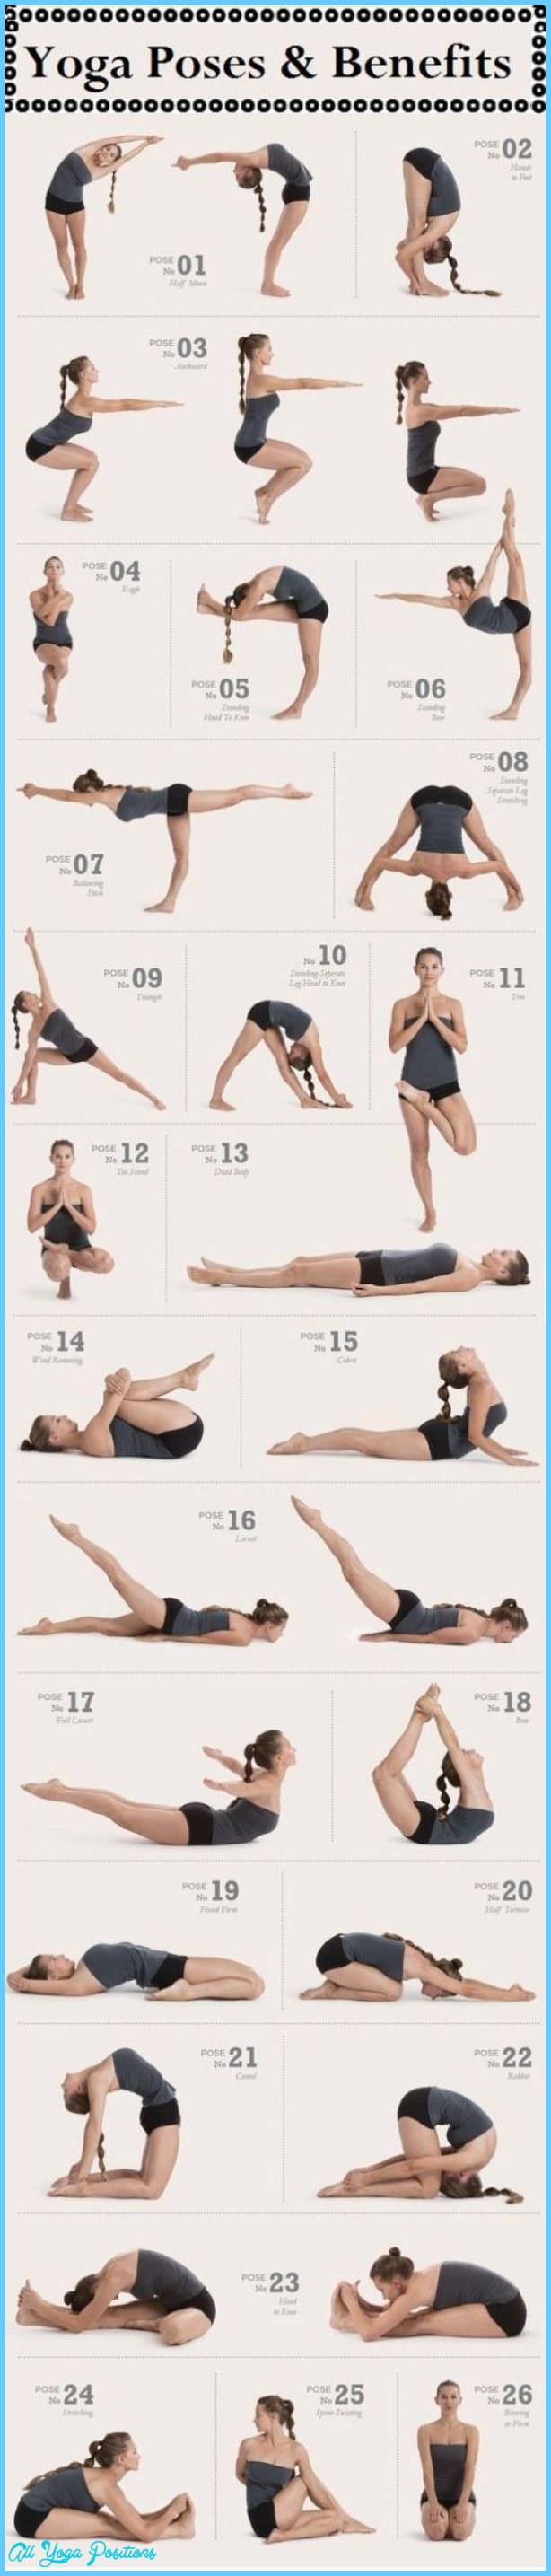 Yoga poses benefits  _6.jpg